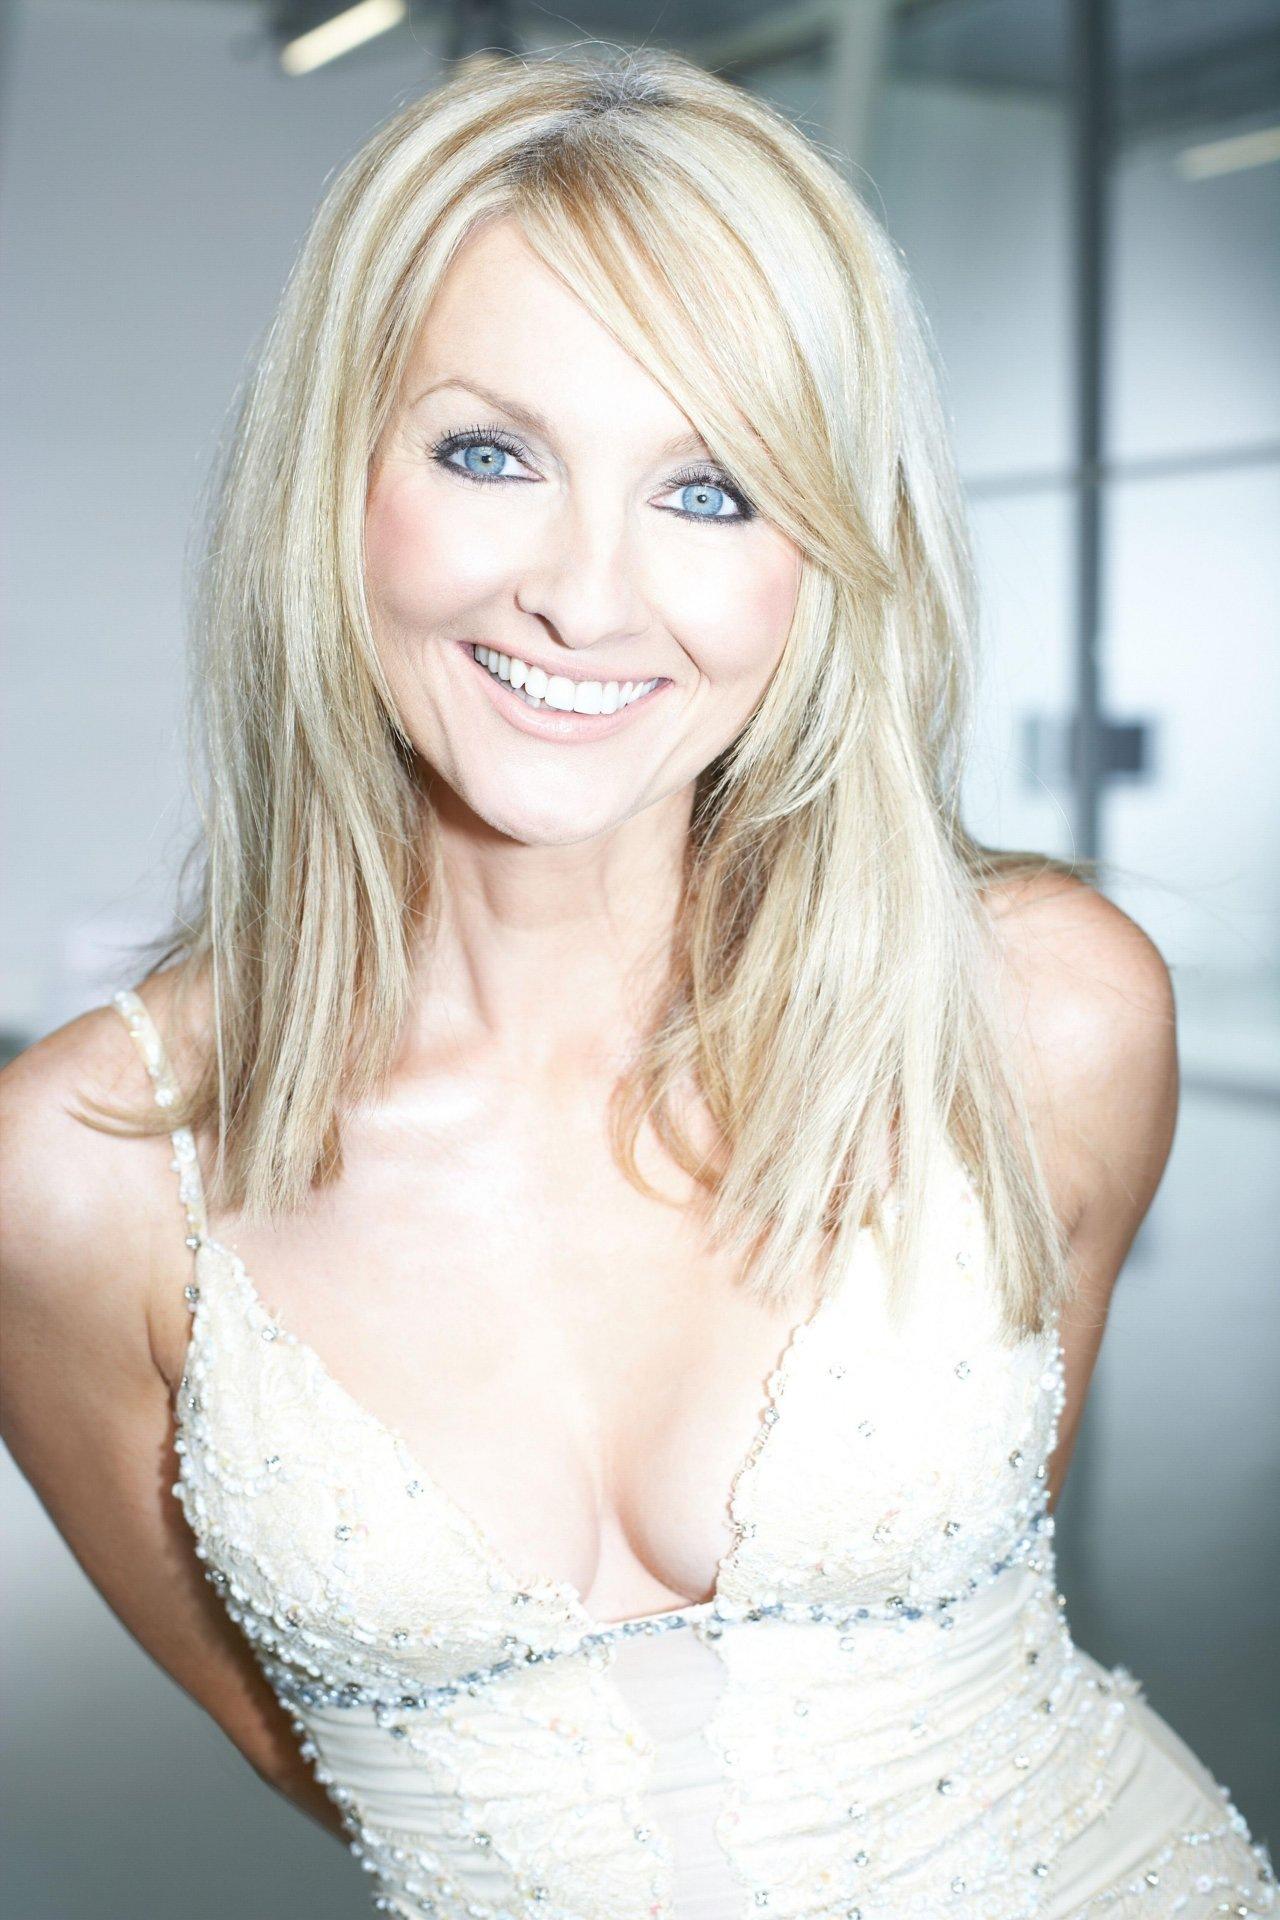 Picture of Frauke Ludowig - high resolution celebrity